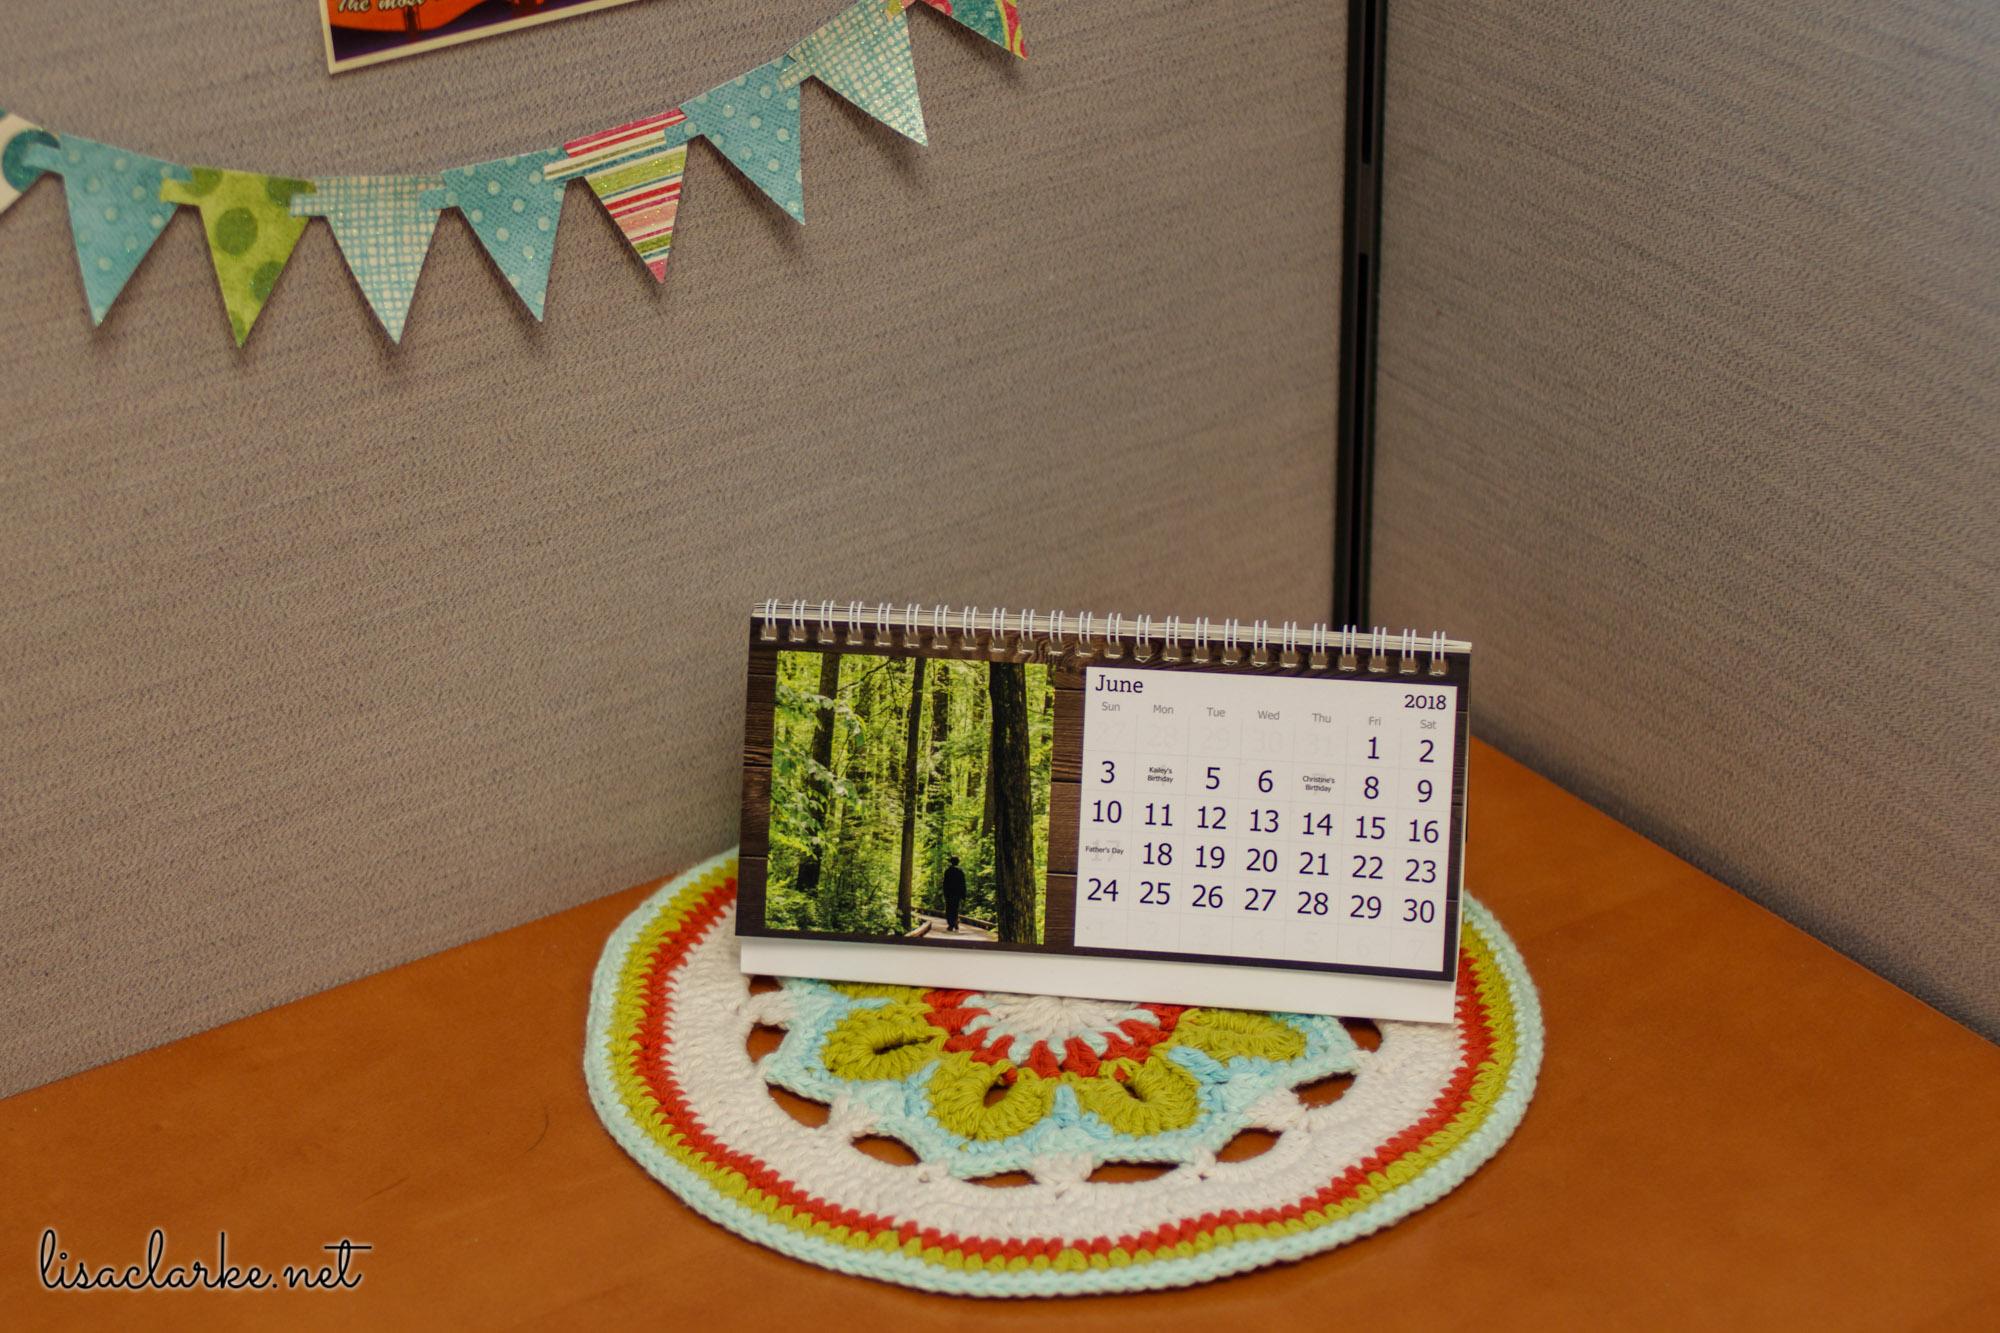 Ways to Make Your Cubicle Less Awful: Mandala and Custom Desk Calendar